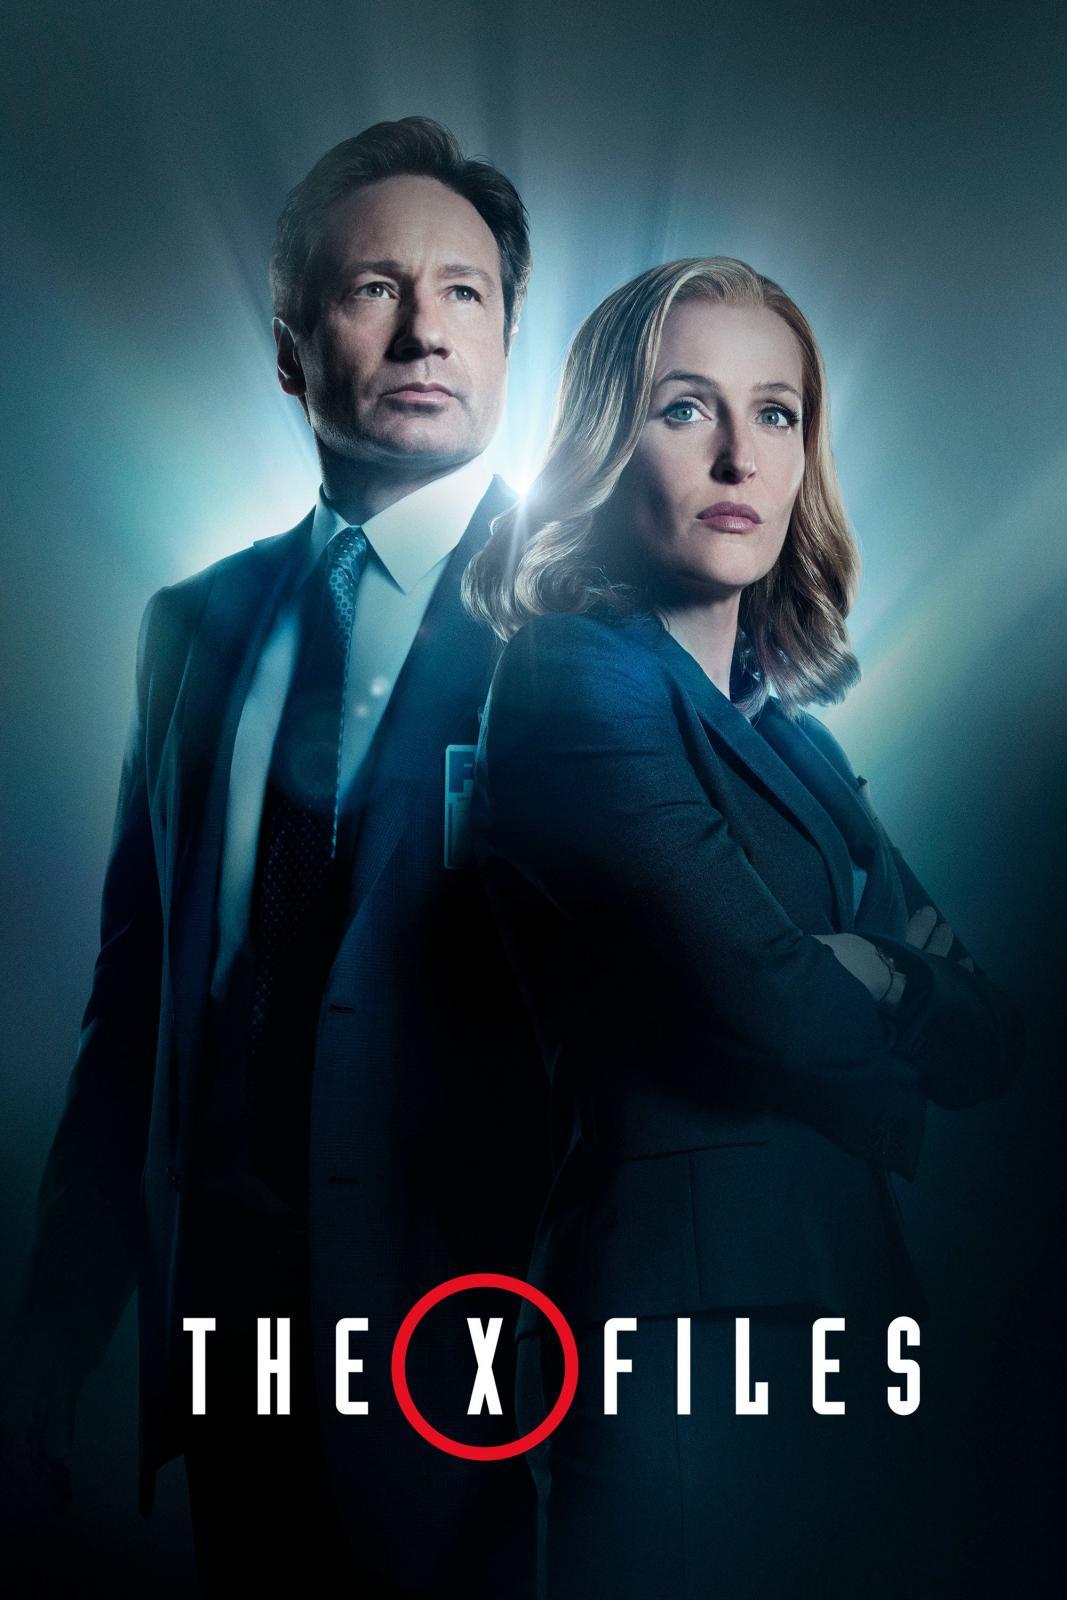 The X-Files 2016 - PROMO.jpg